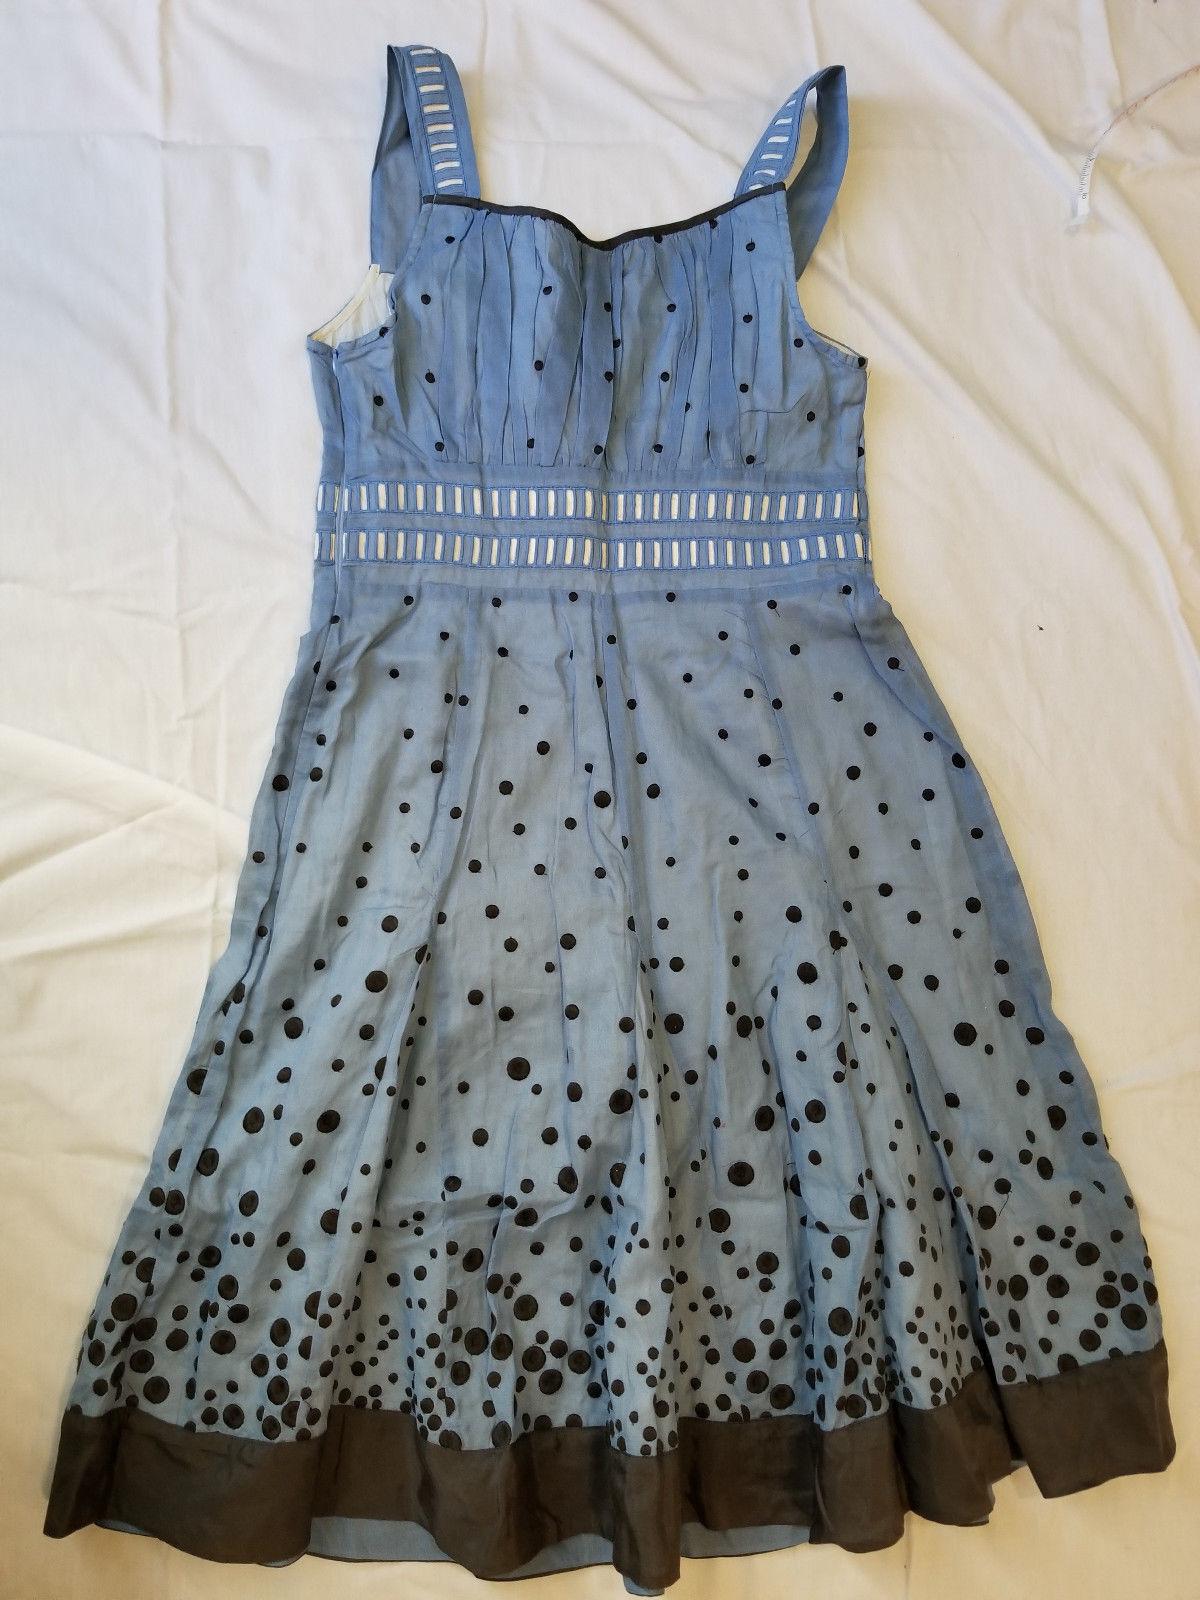 NWT 4 FLOREAT Anthropologie RARE Vintage Blau Embroiderot Day Dress